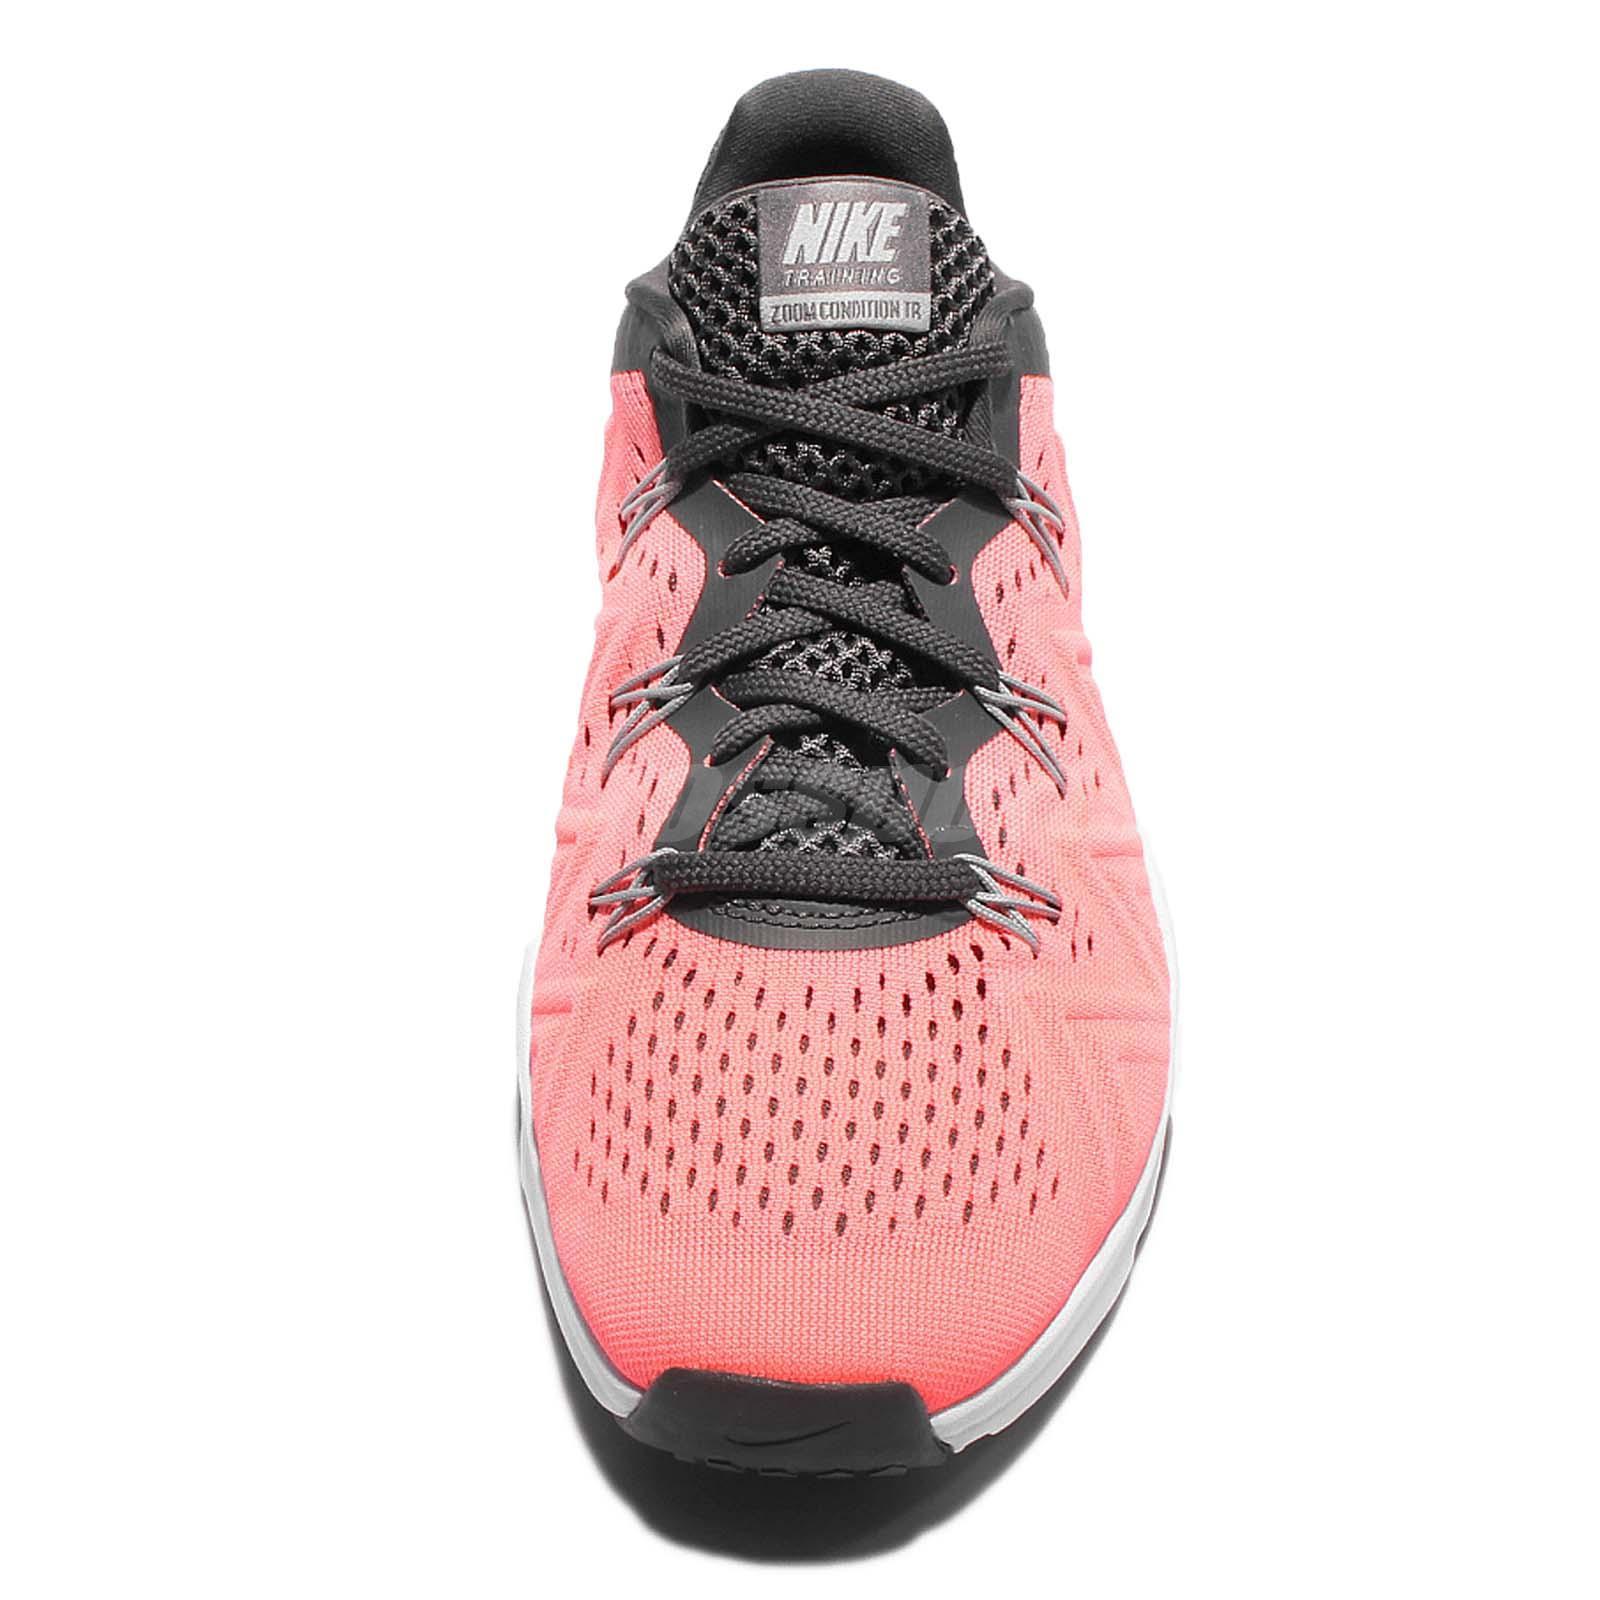 724b9c846c30 Nike Wmns Zoom Condition TR Pink Black Women Cross Training Shoes ...